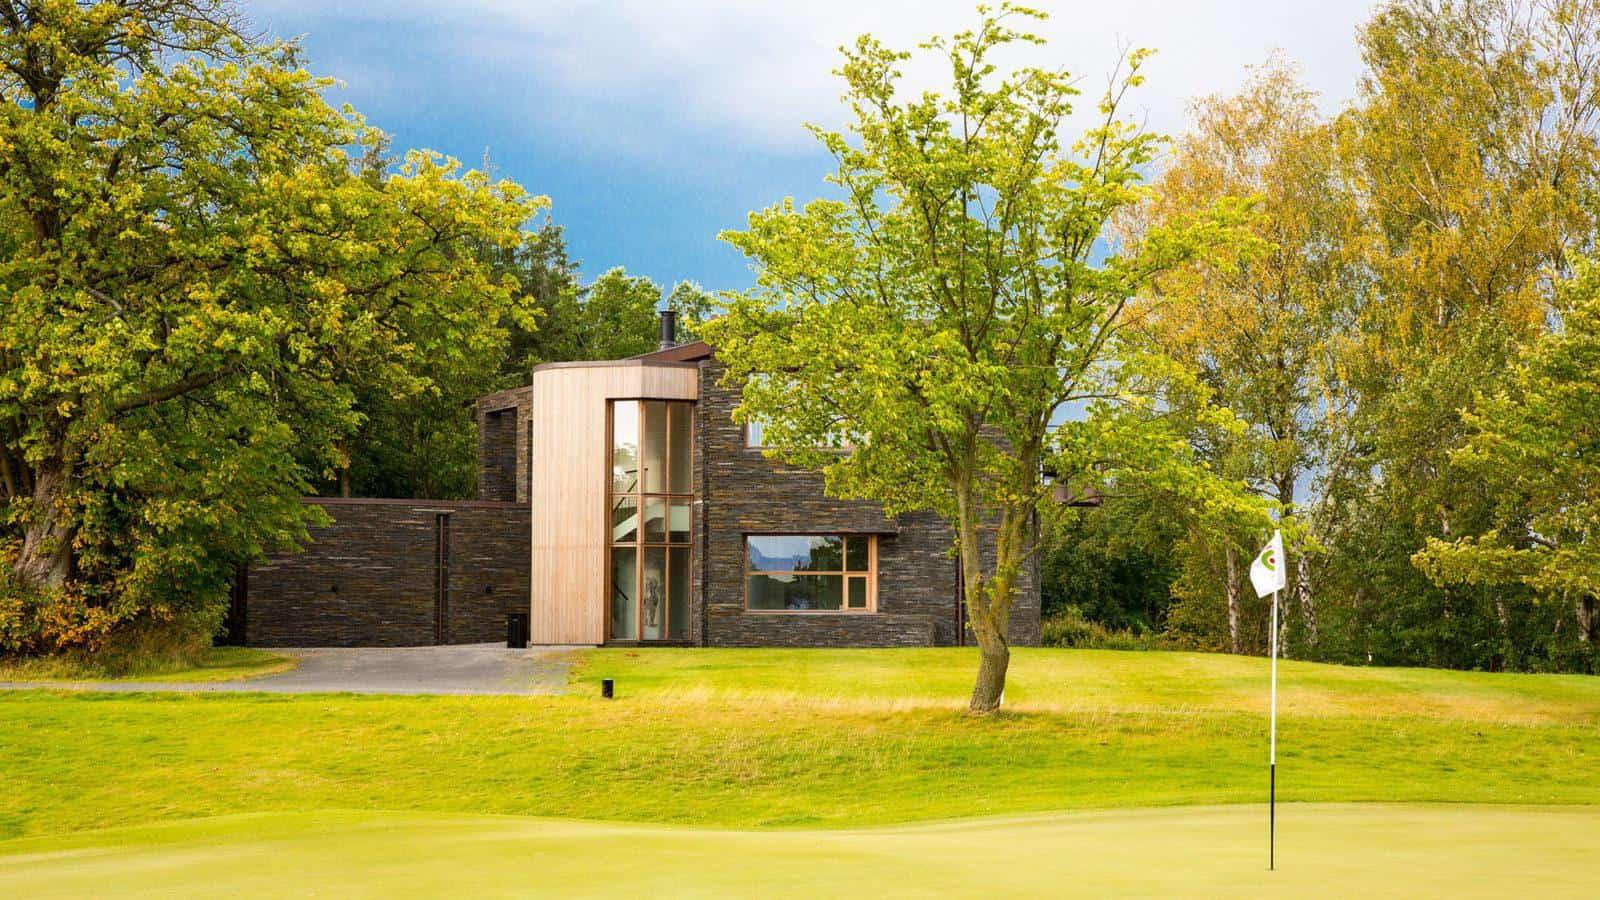 antal golfspillere i danmark